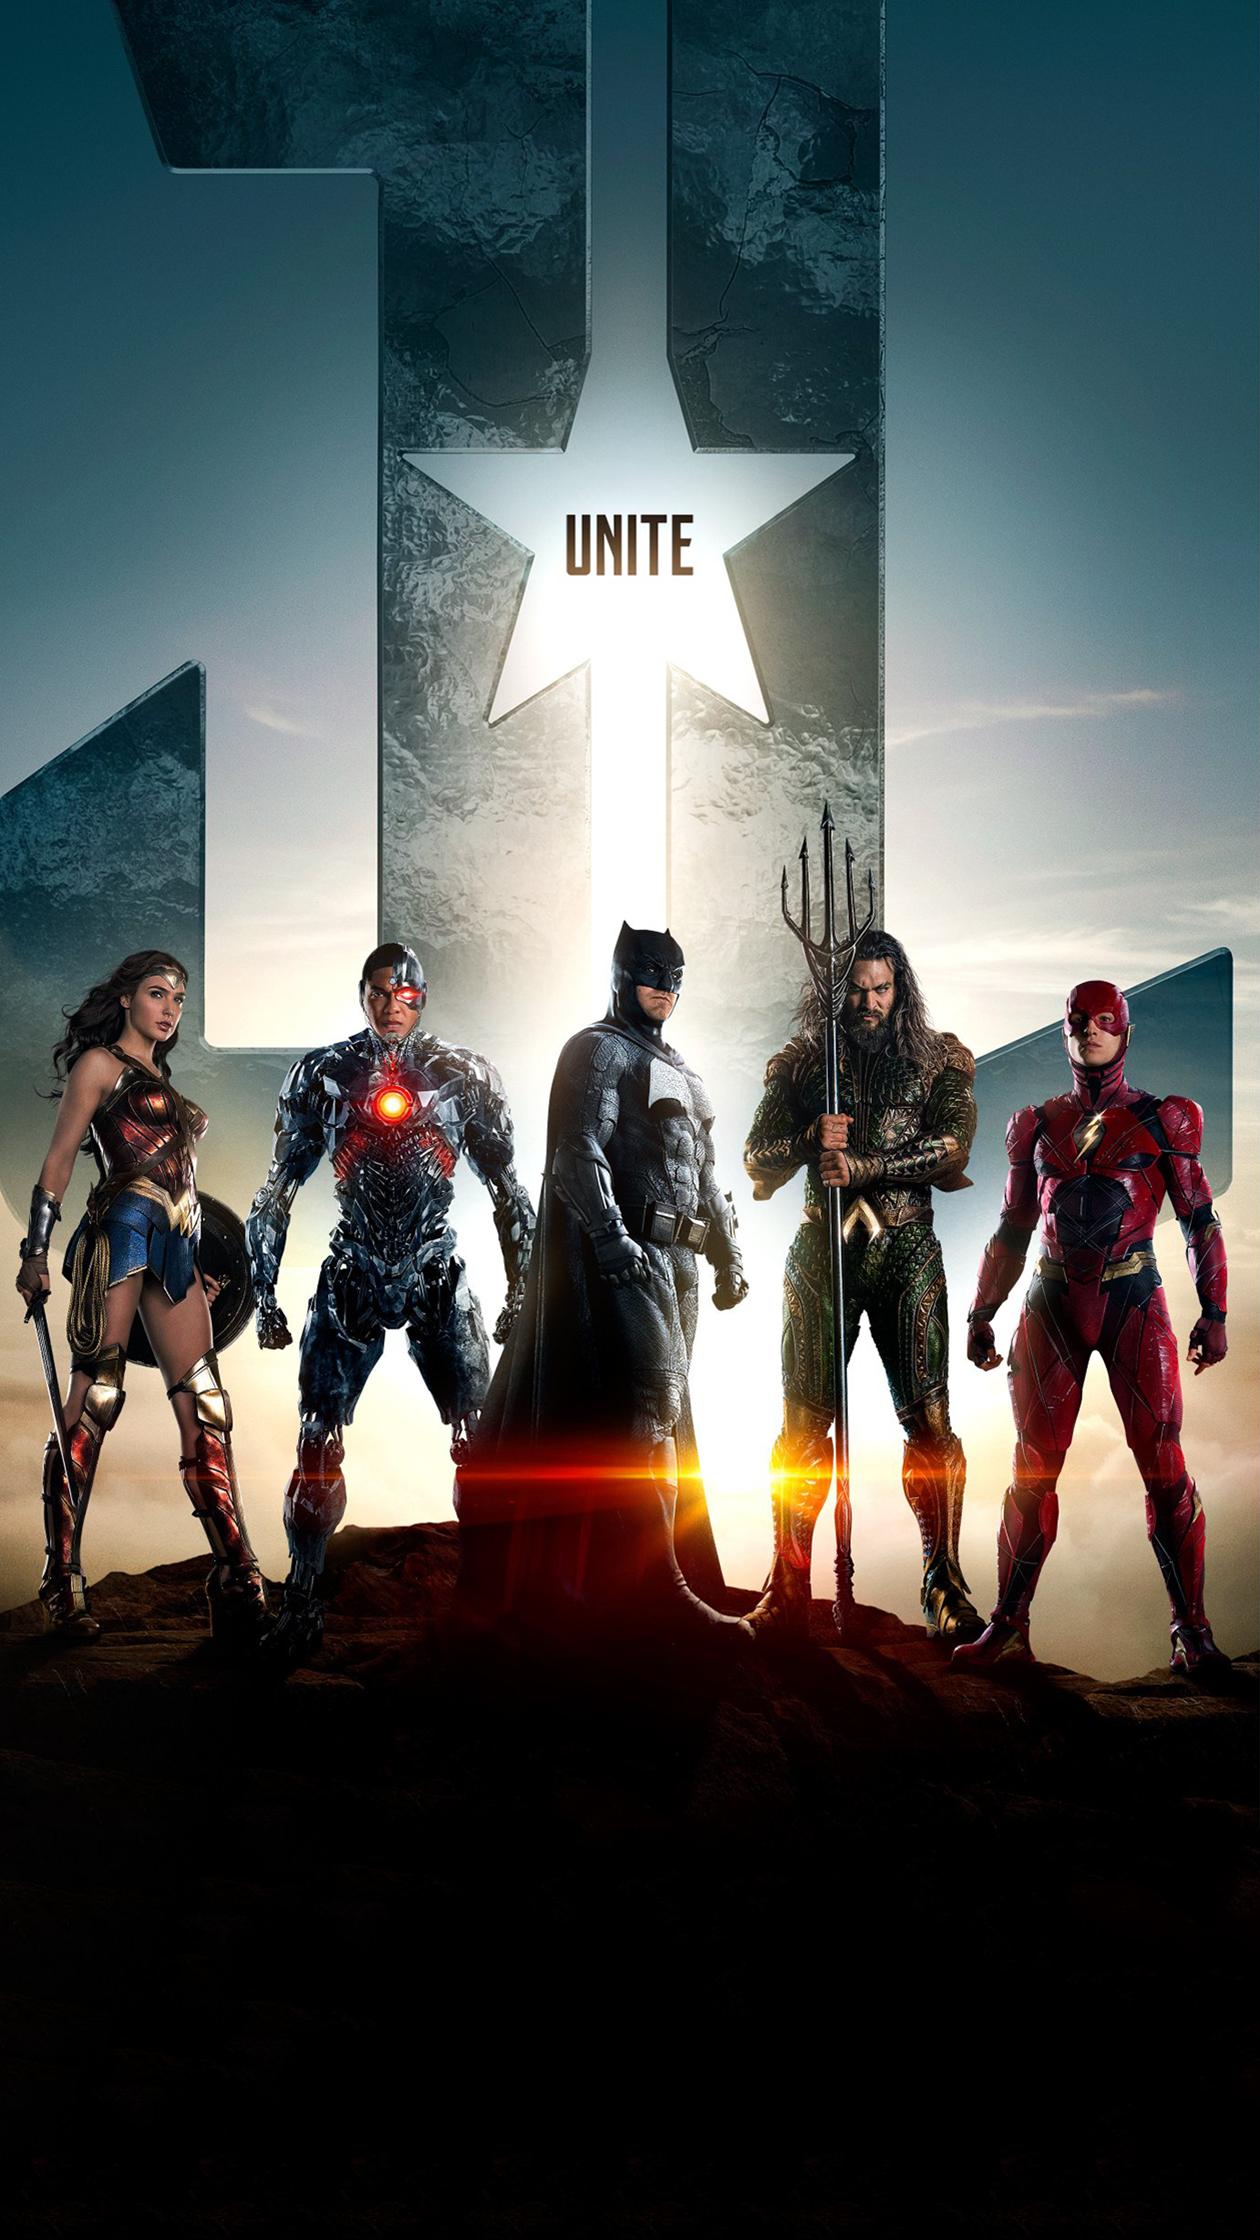 People 1260x2240 portrait display Justice League (2017) Batman Wonder Woman Flash Aquaman Cyborg (DC Comics) movies